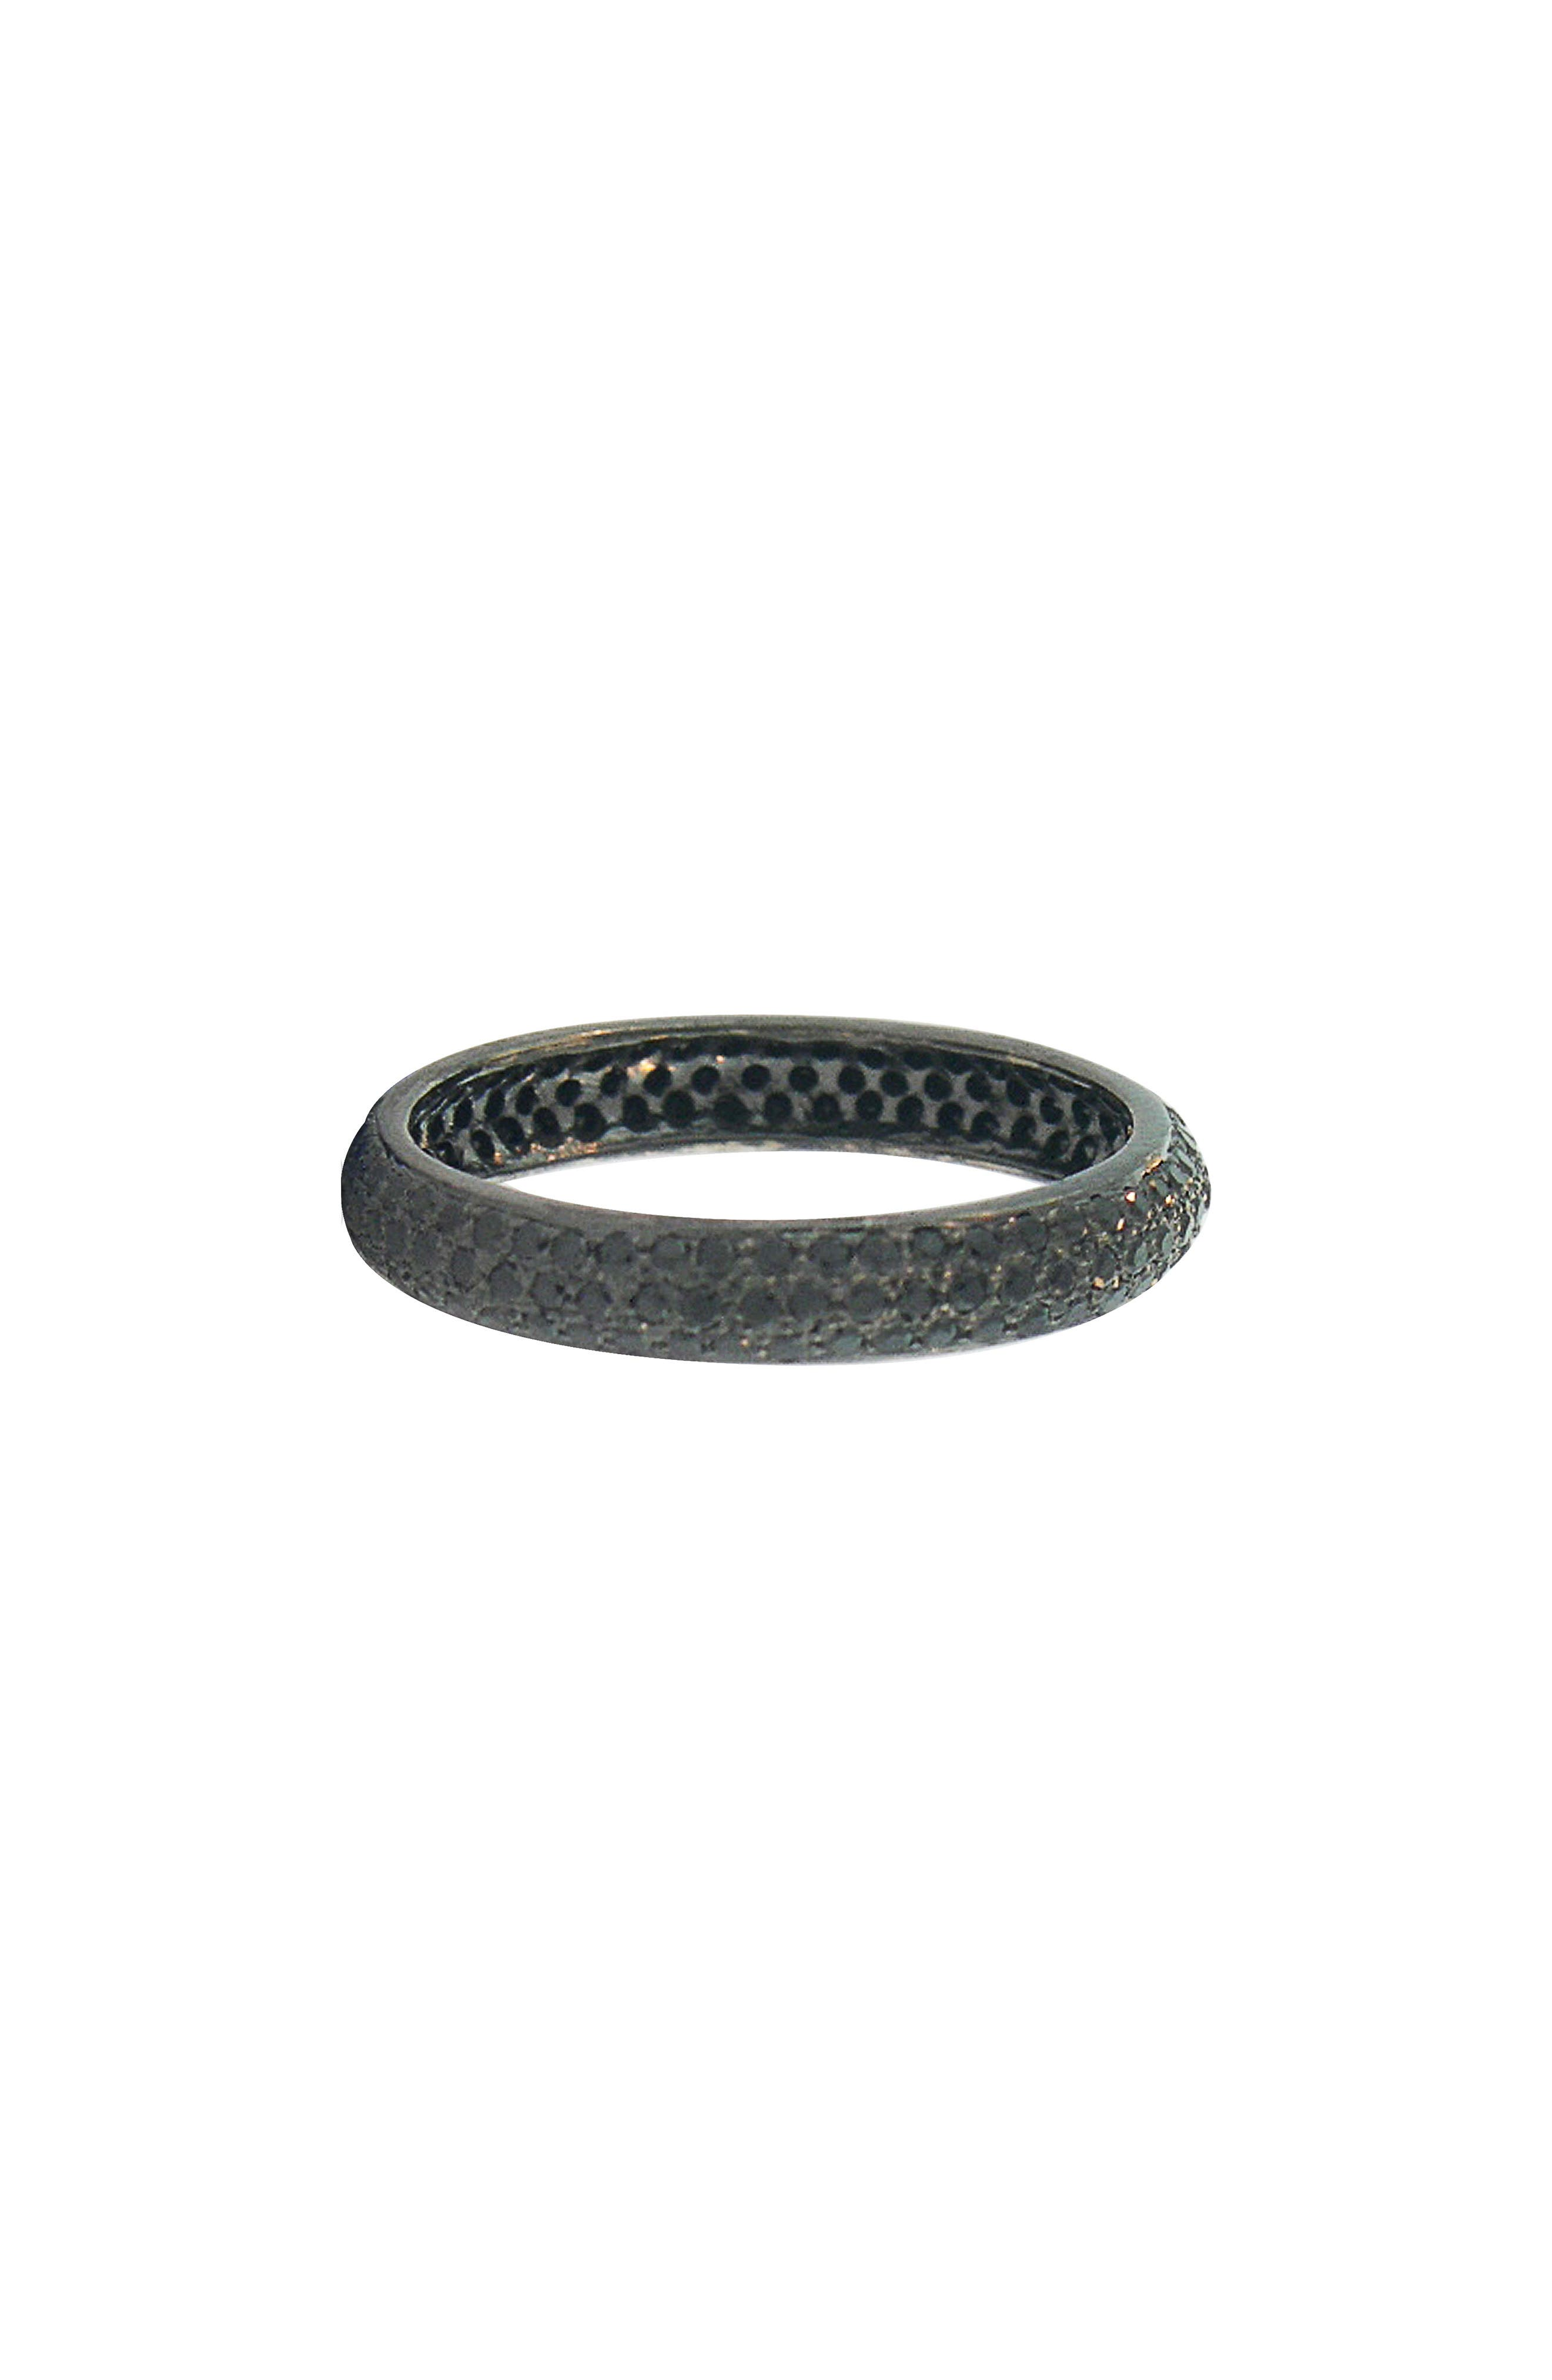 SETHI COUTURE PAVE DIAMOND BAND RING